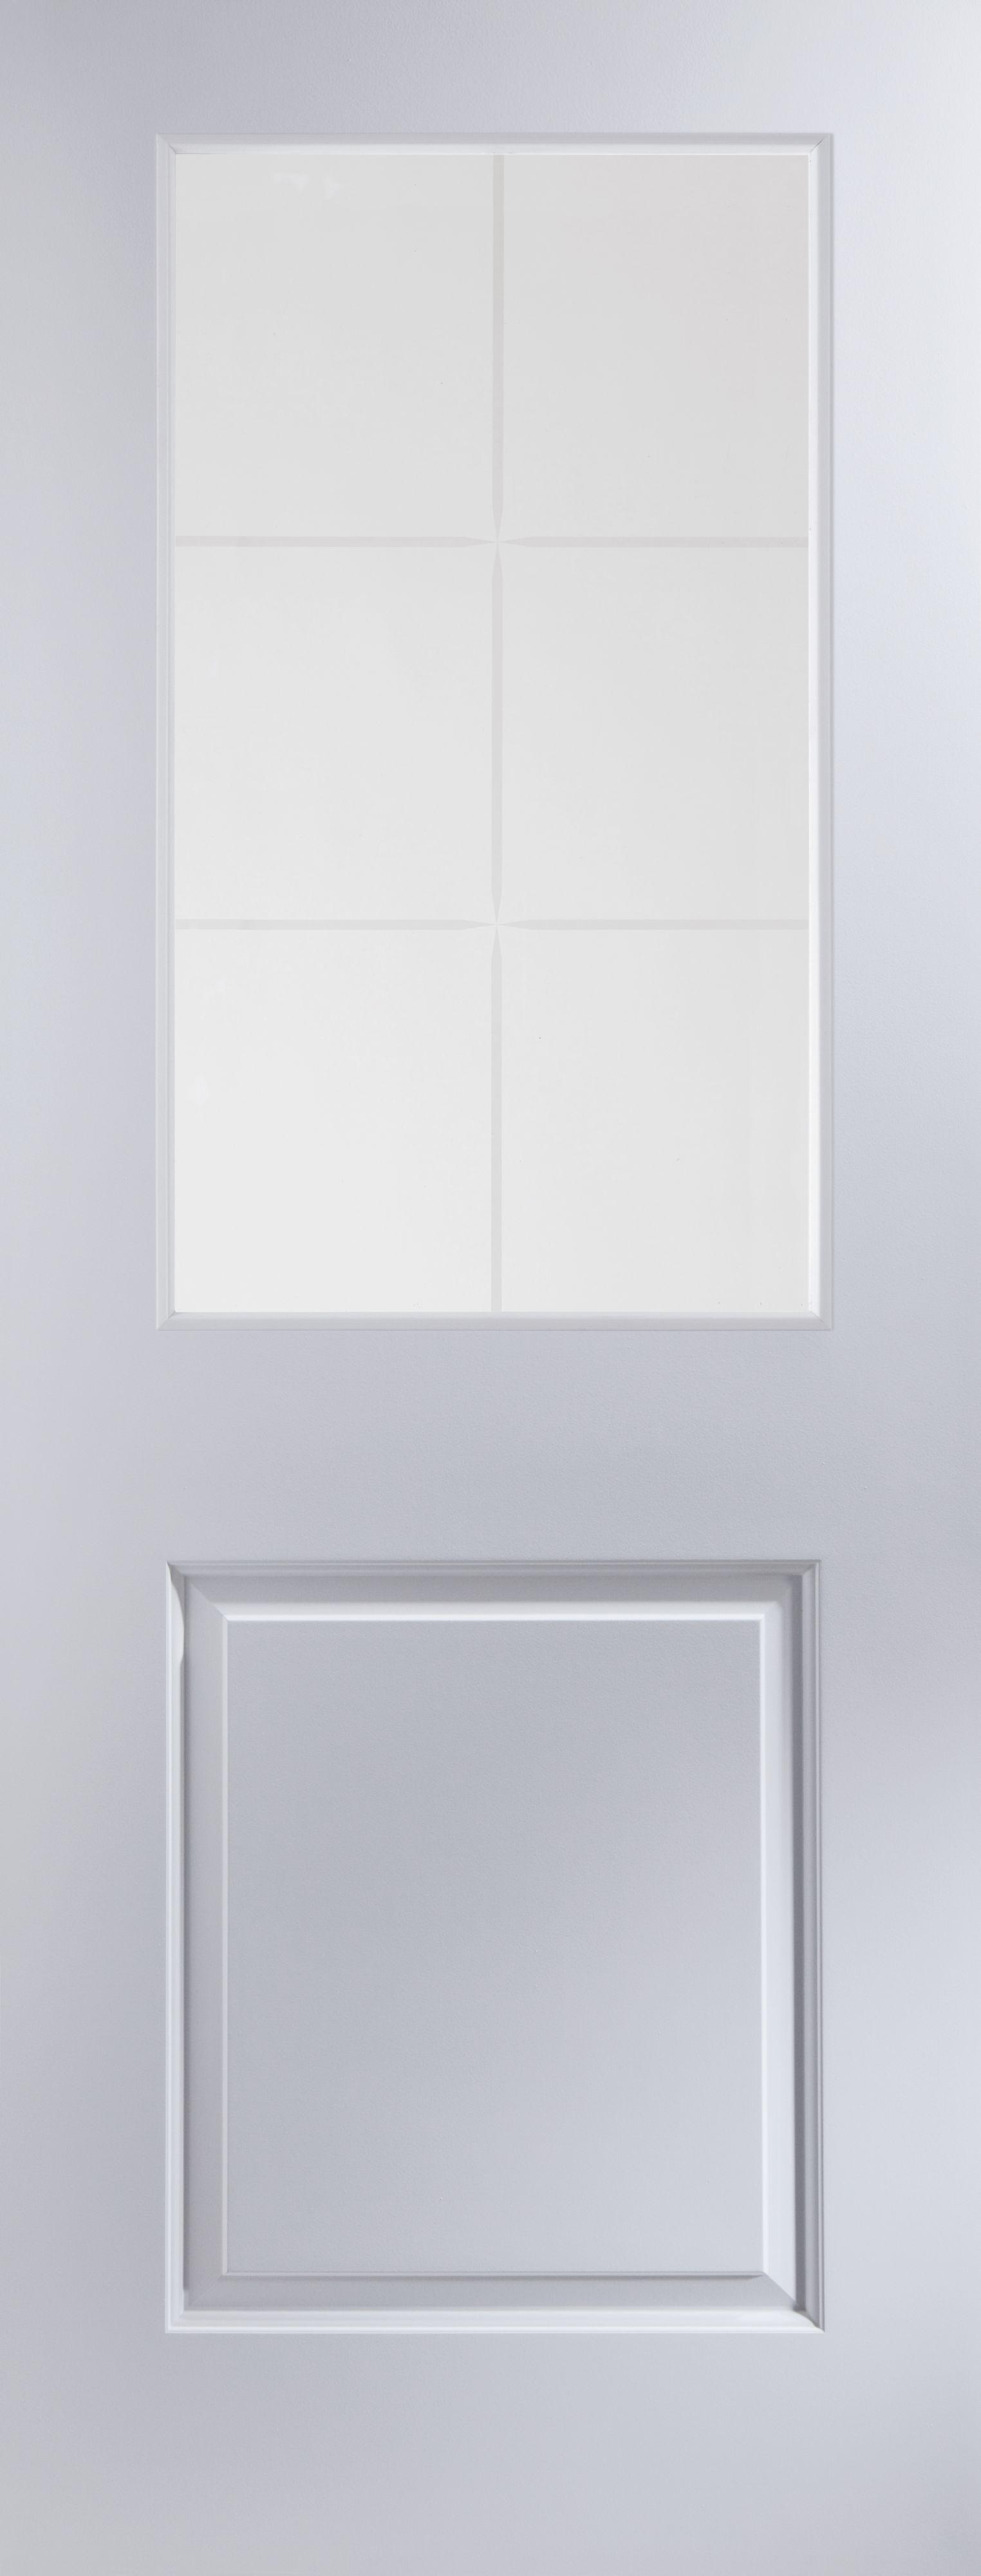 2 Panel 6 Lite Pre-painted White Glazed Internal Standard Door, (h)1981mm (w)838mm